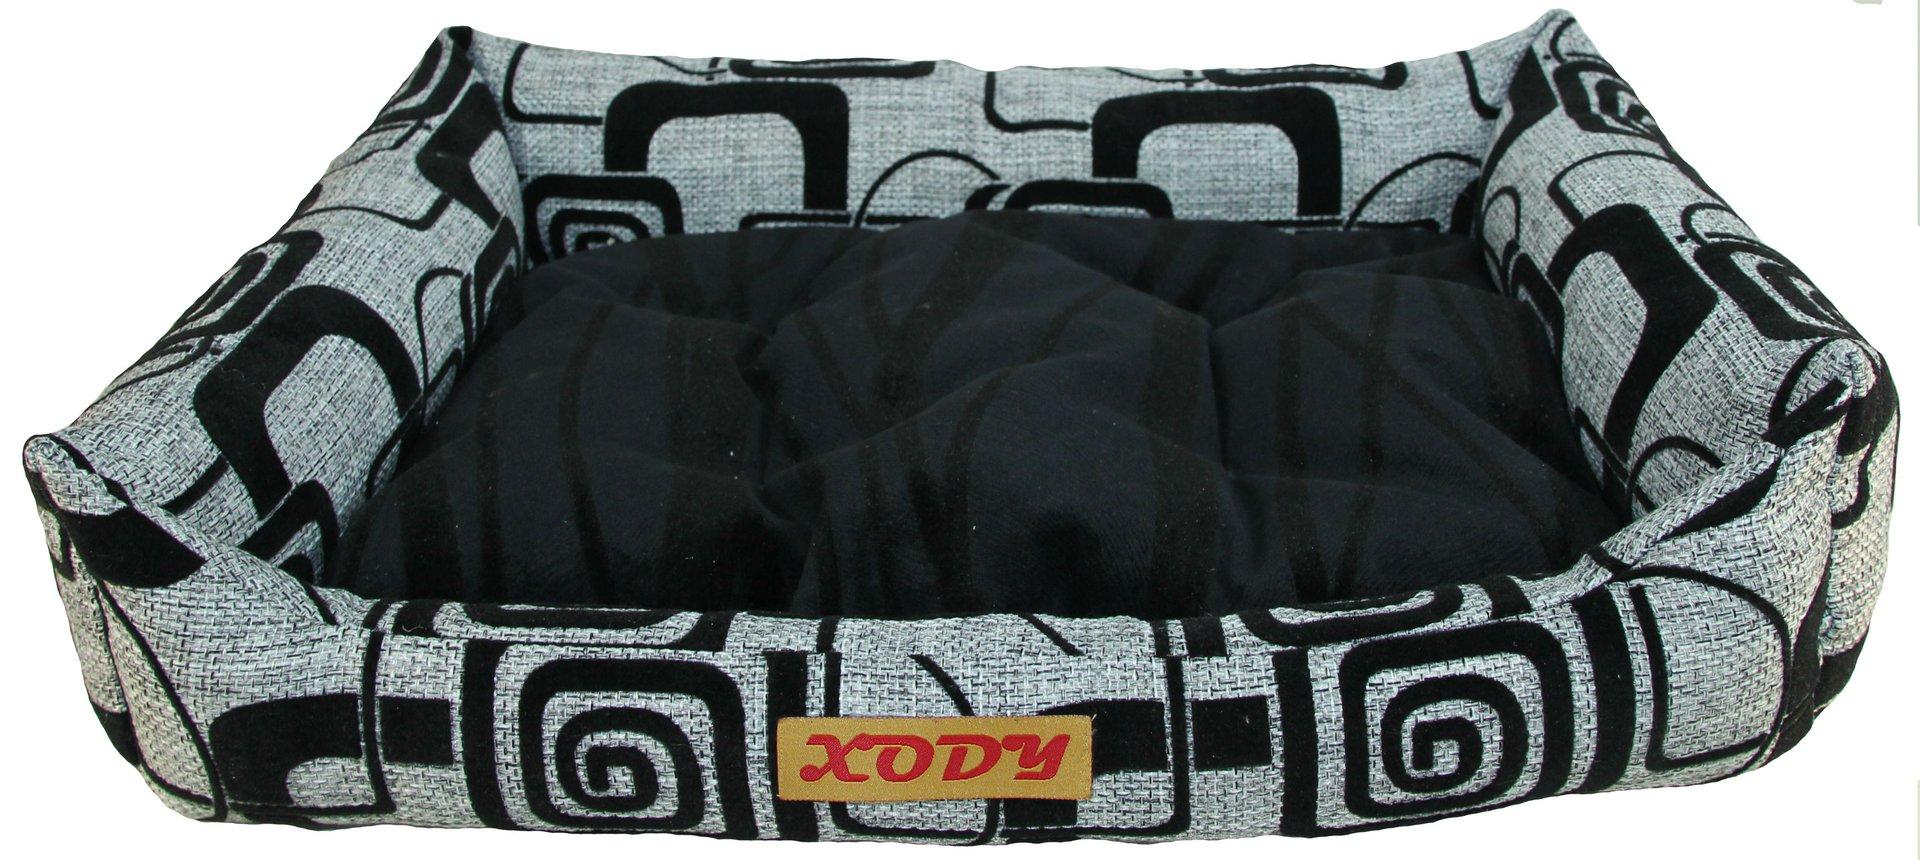 Лежак для собак и кошек Xody Люкс №2, флок, Серый, 60х50х15 см